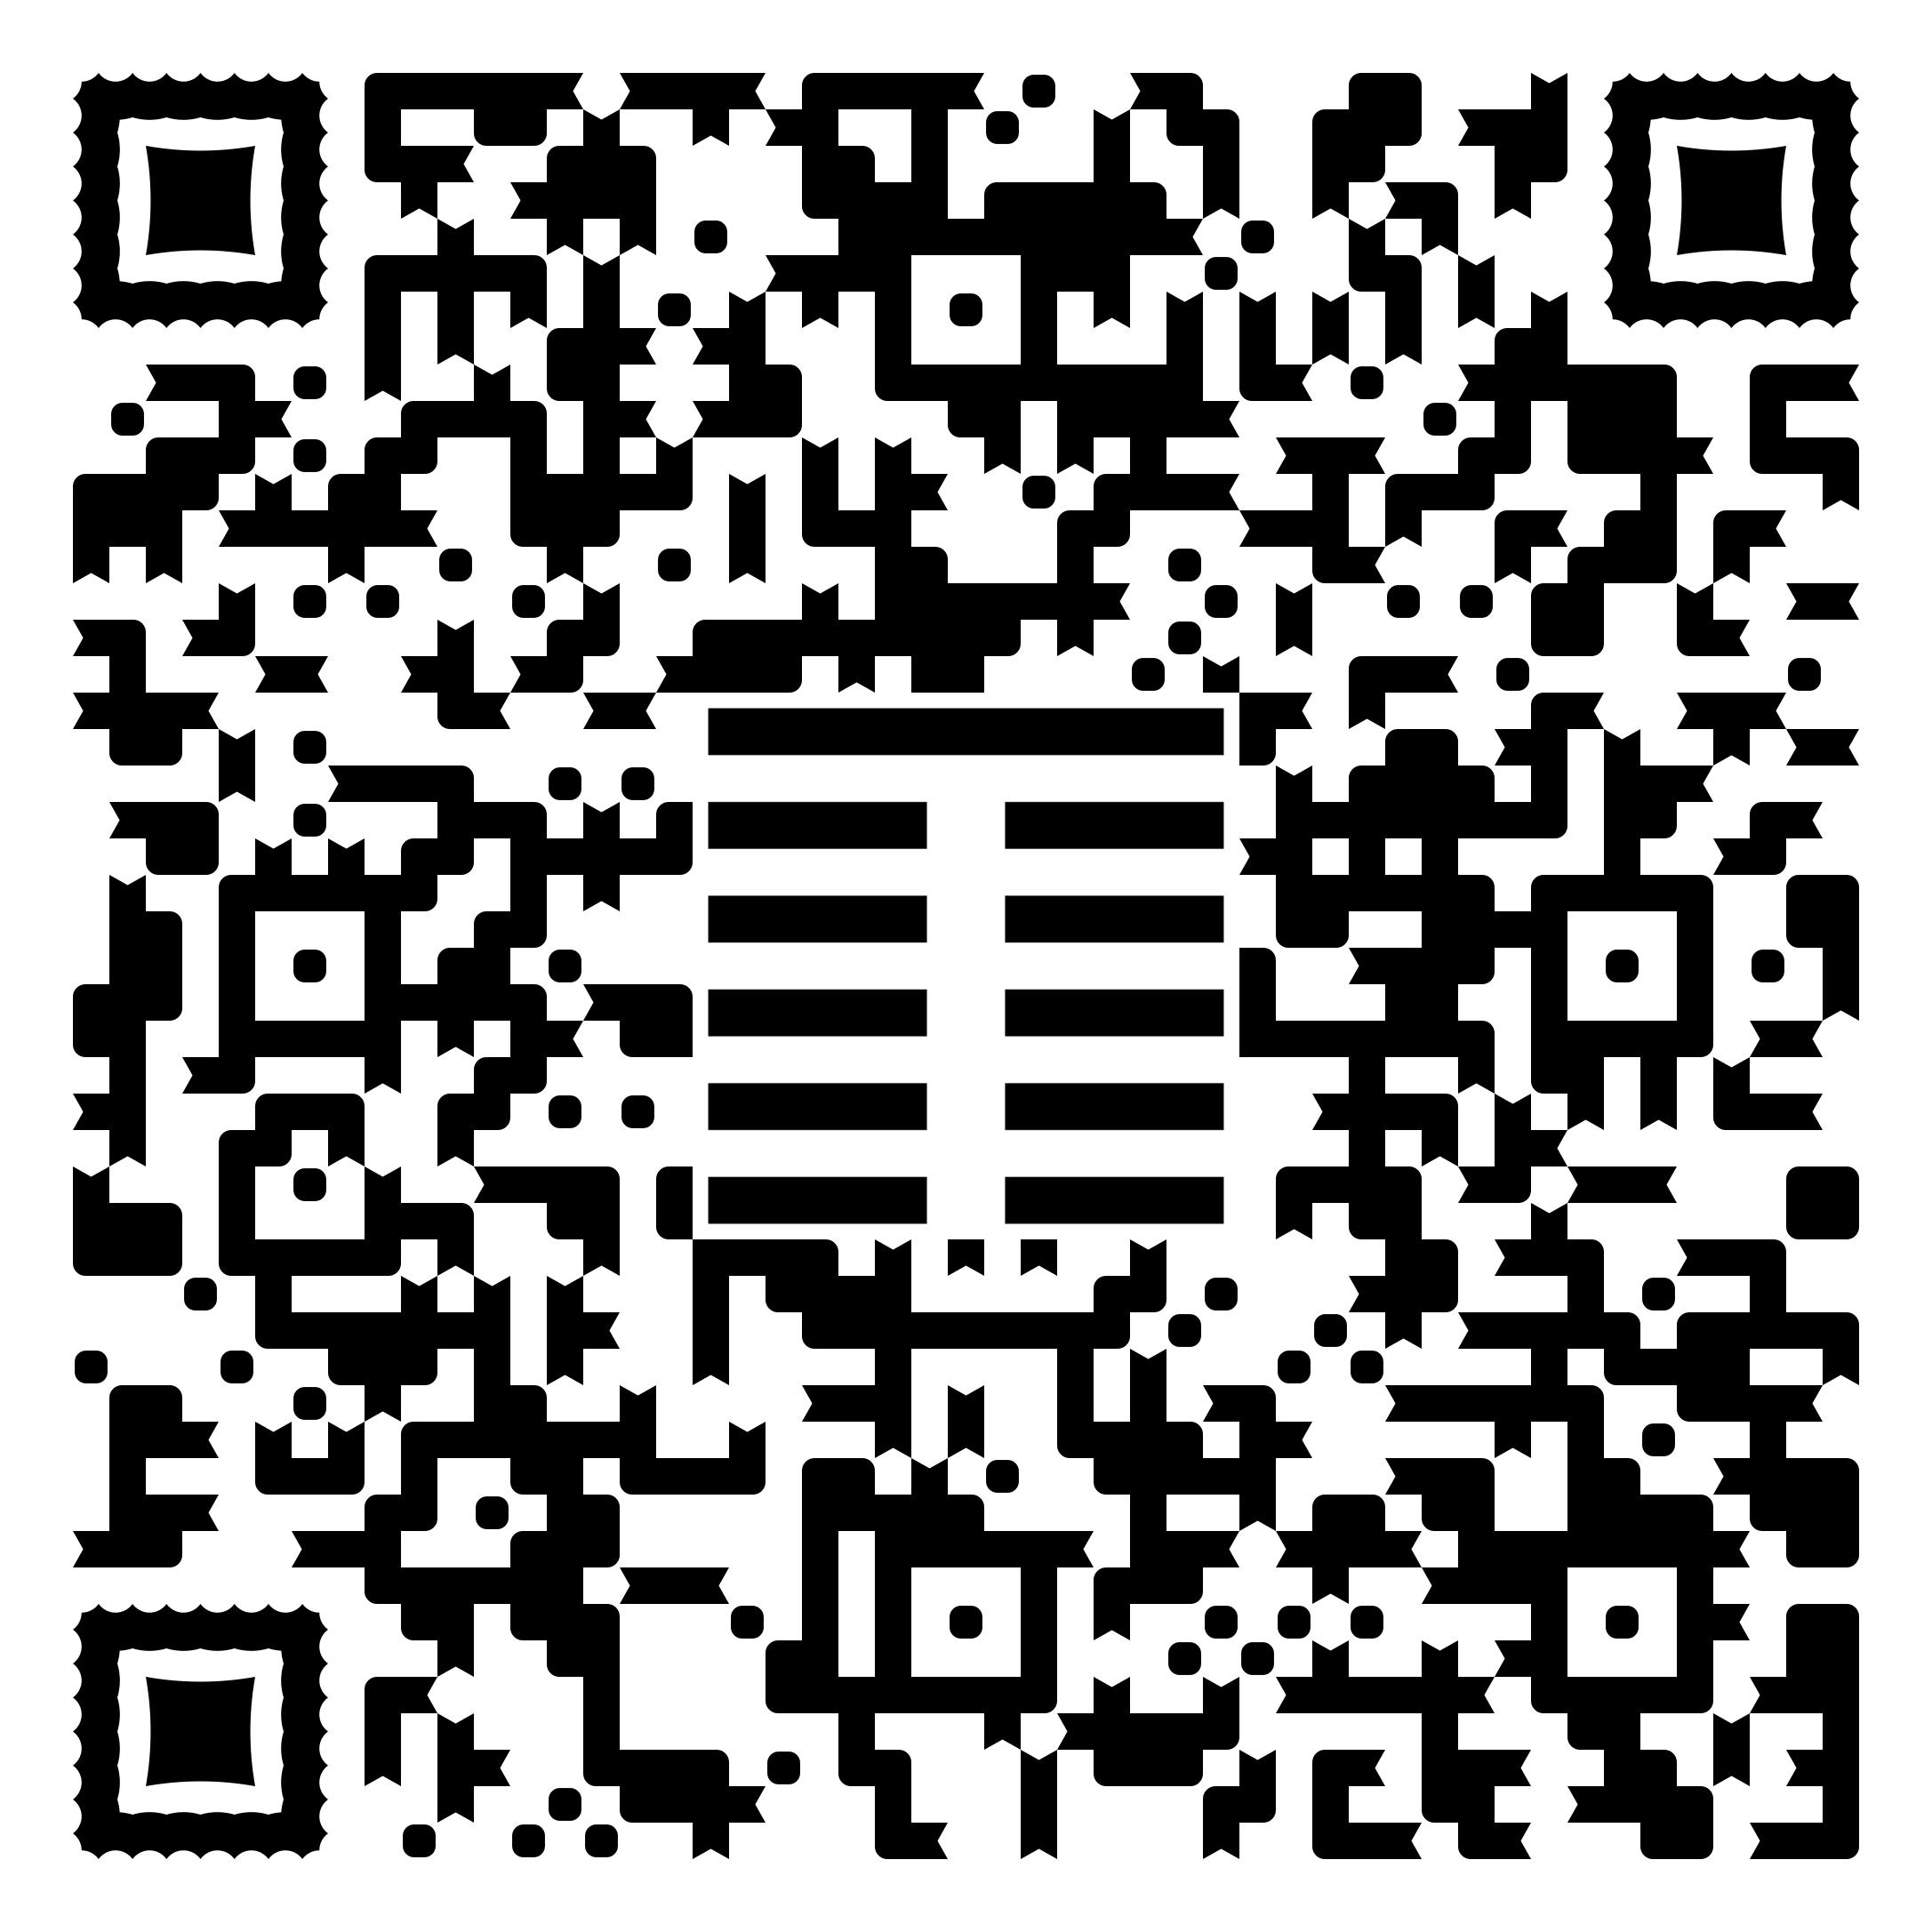 qr-code-23.png